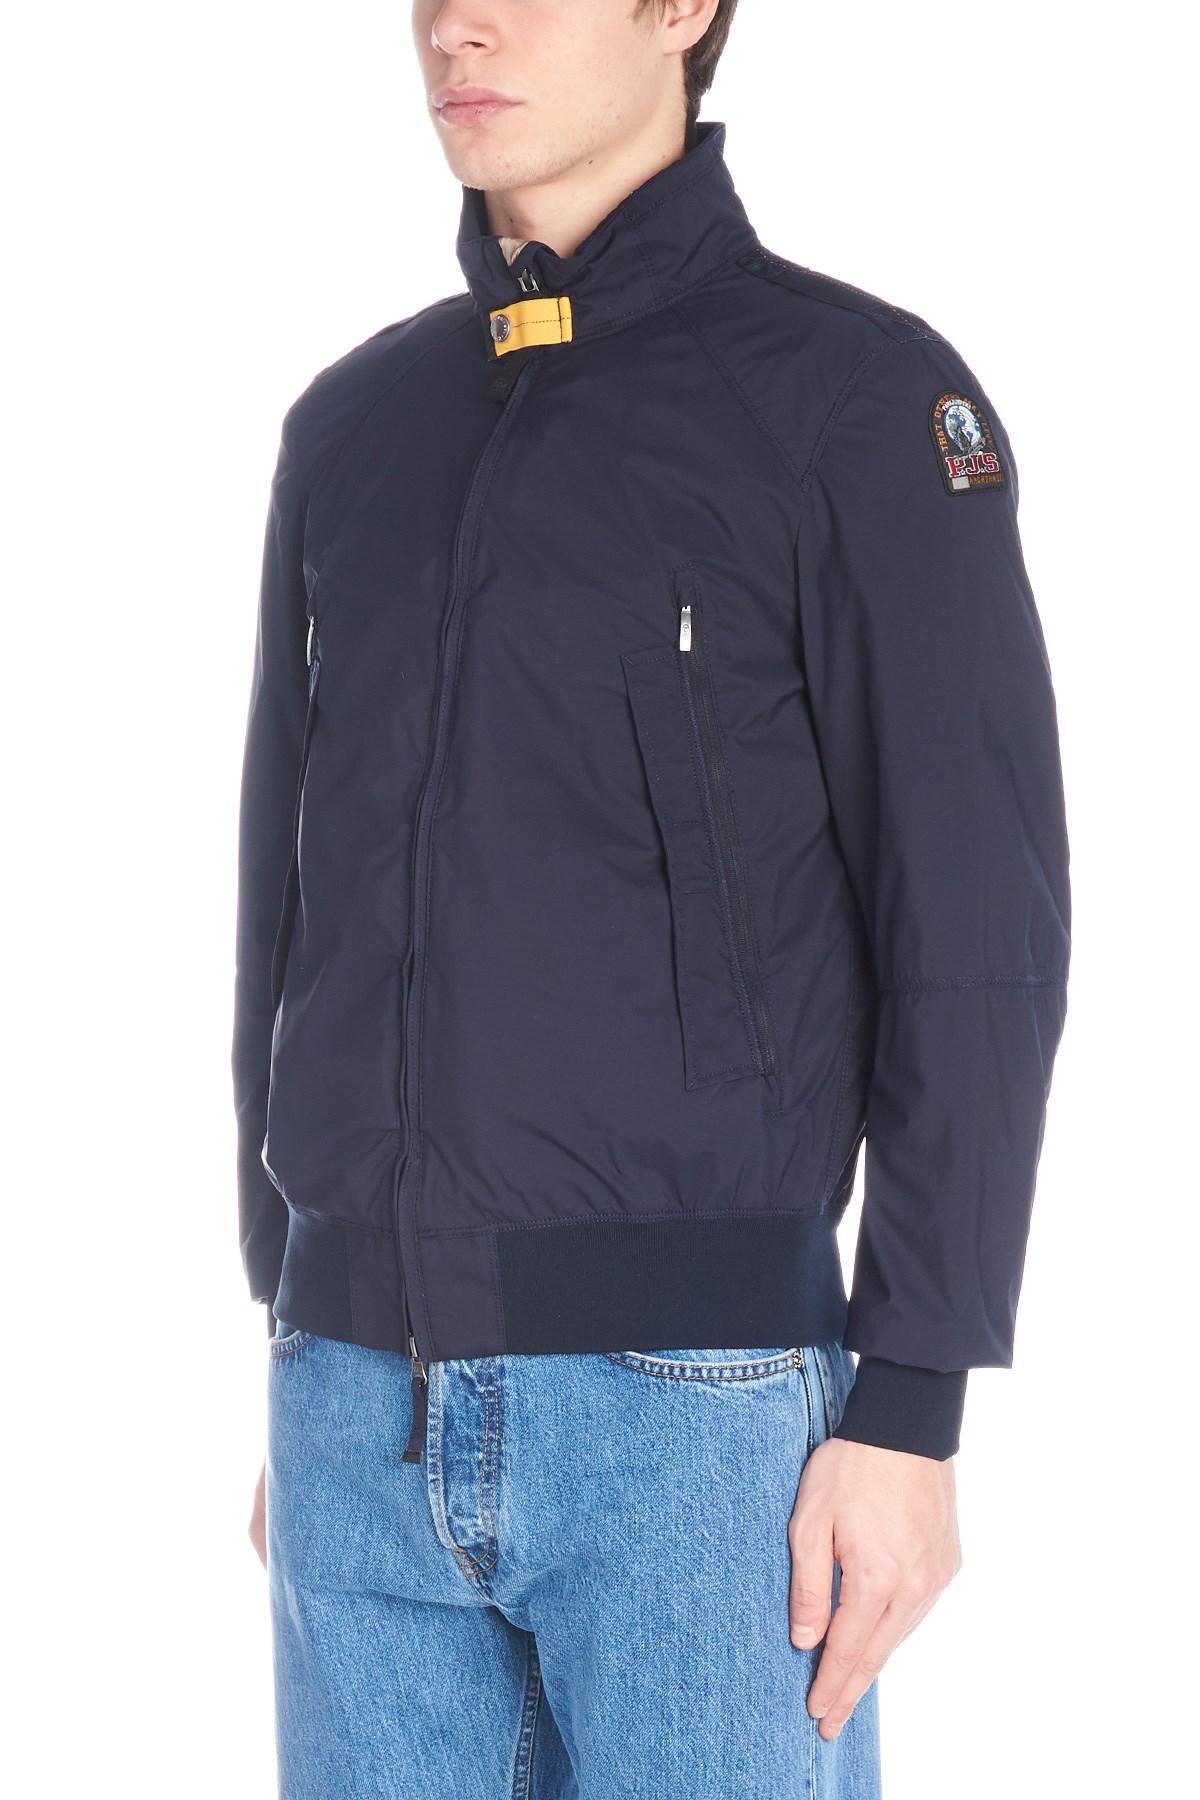 ead7b5c849 parajumpers 'Celsius' jacket available on julian-fashion.com - 64772